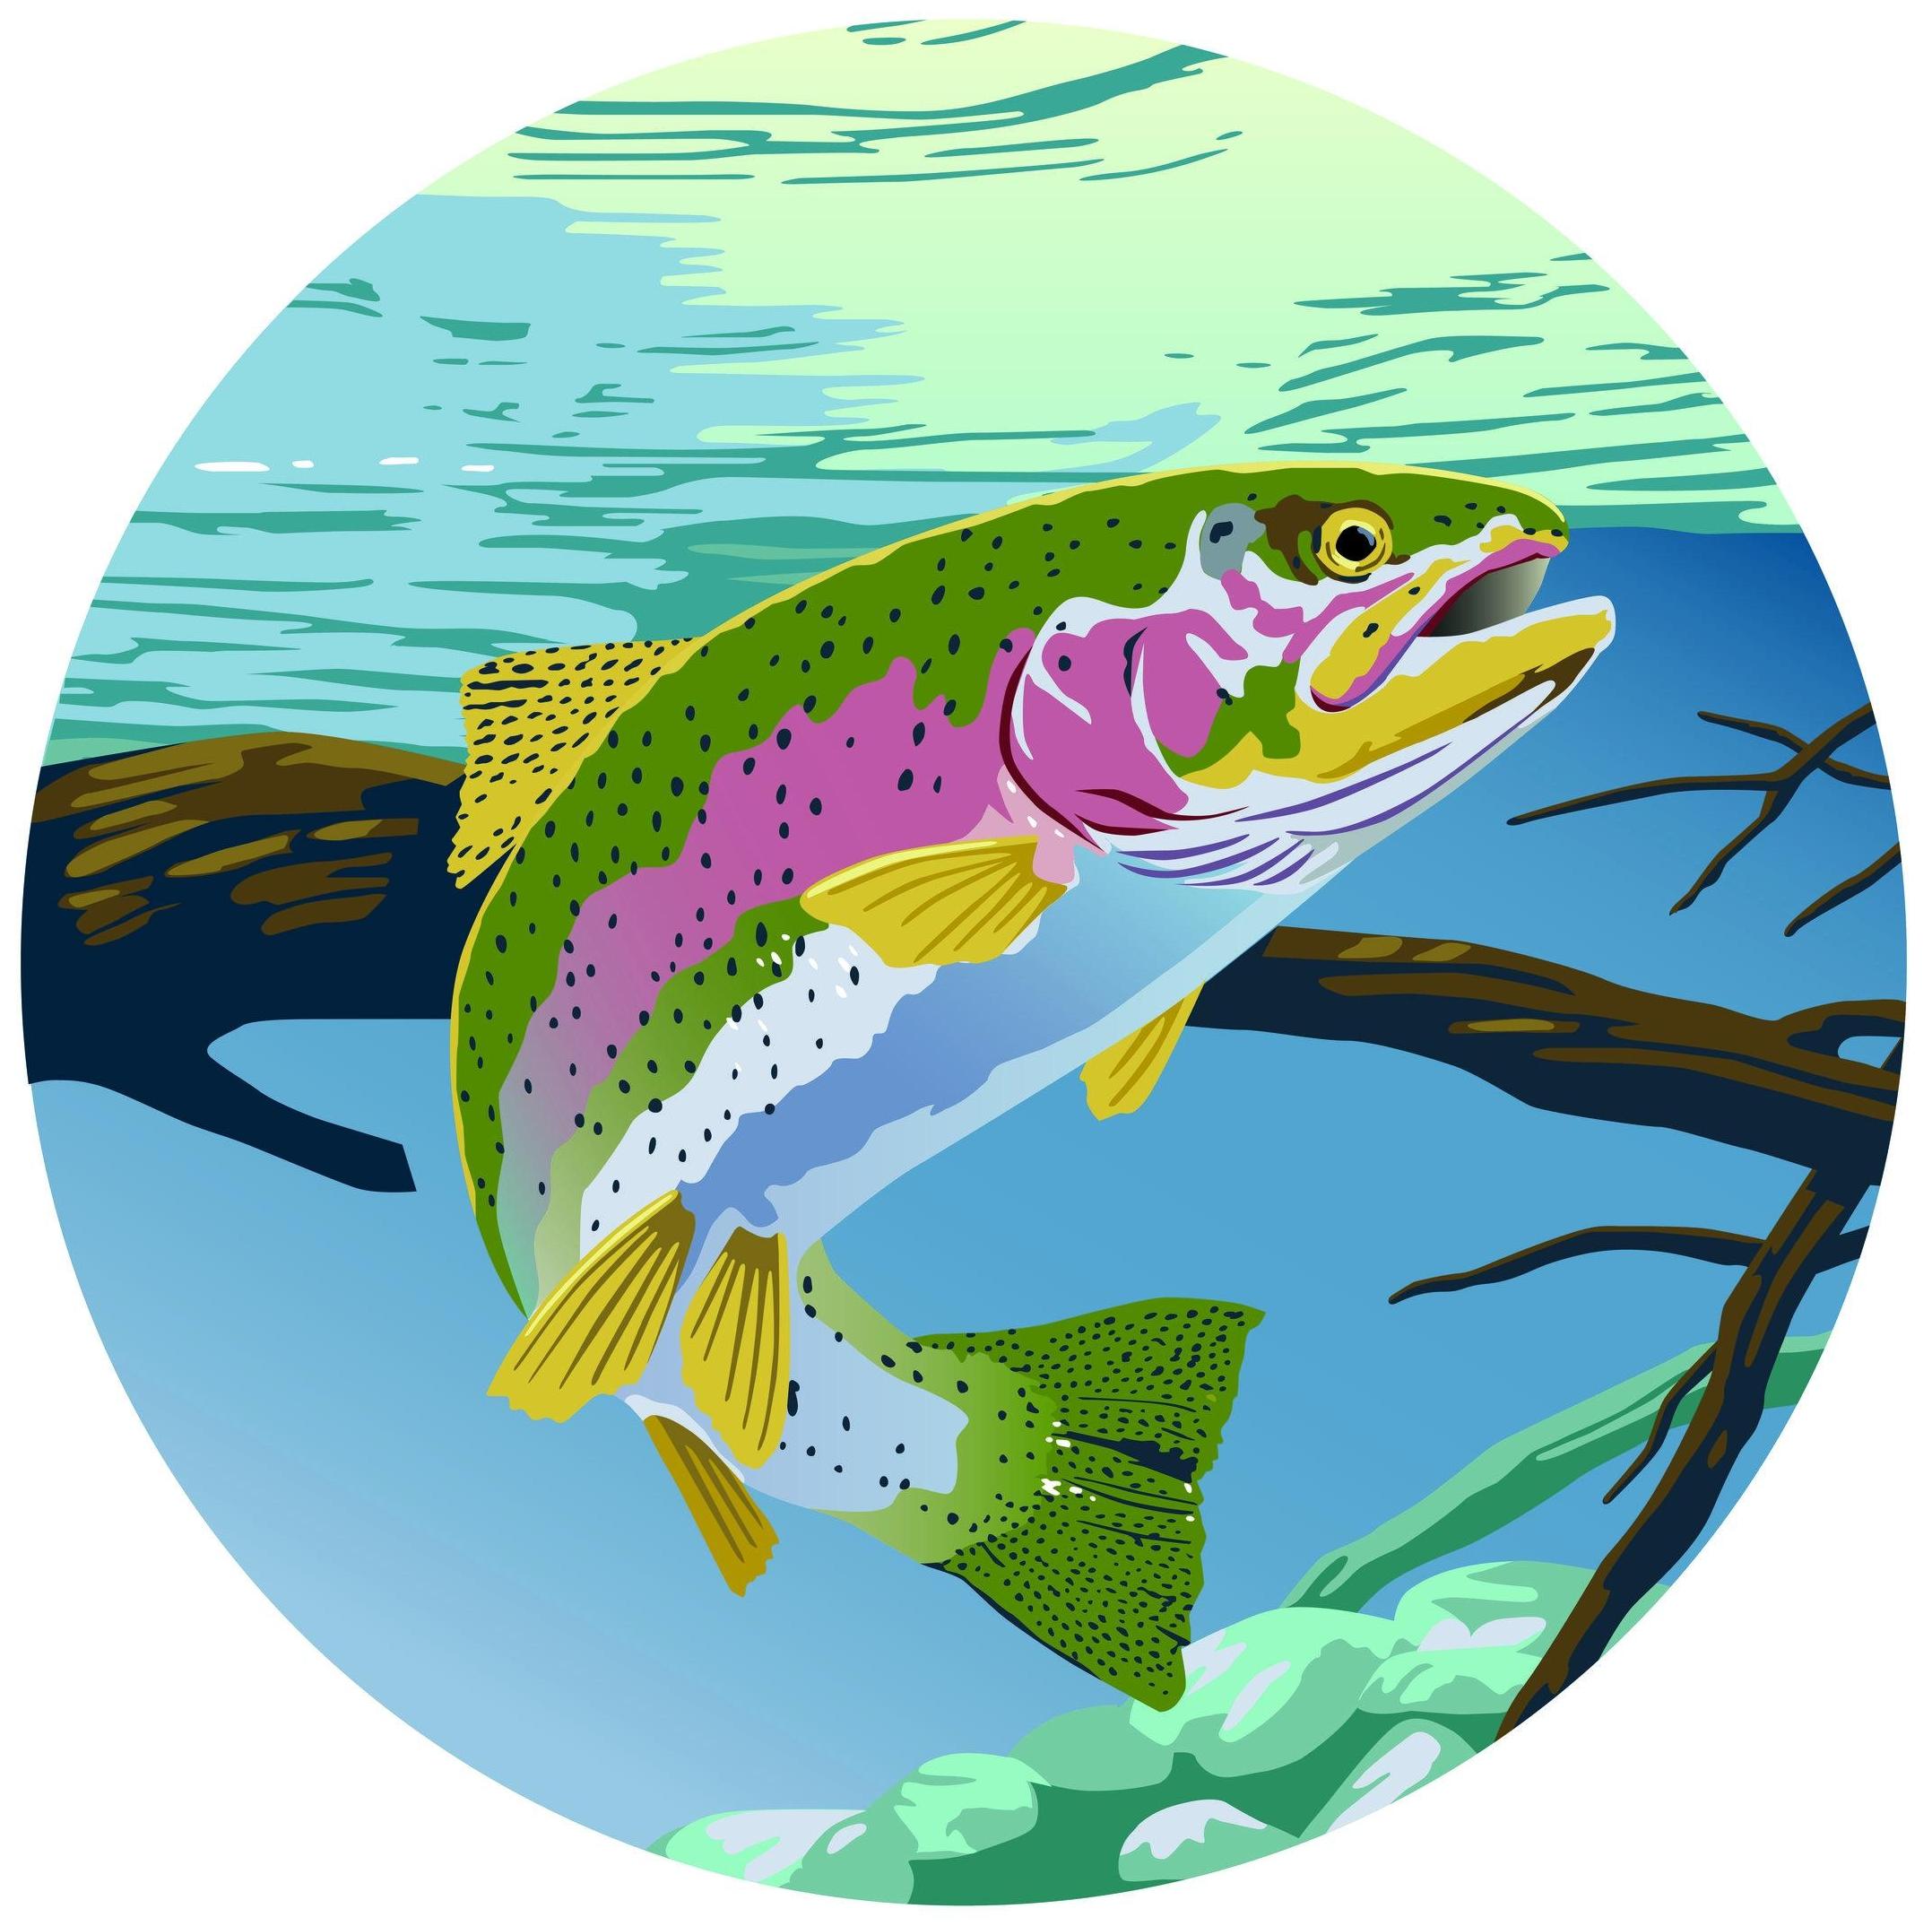 Computer Trout Illustration